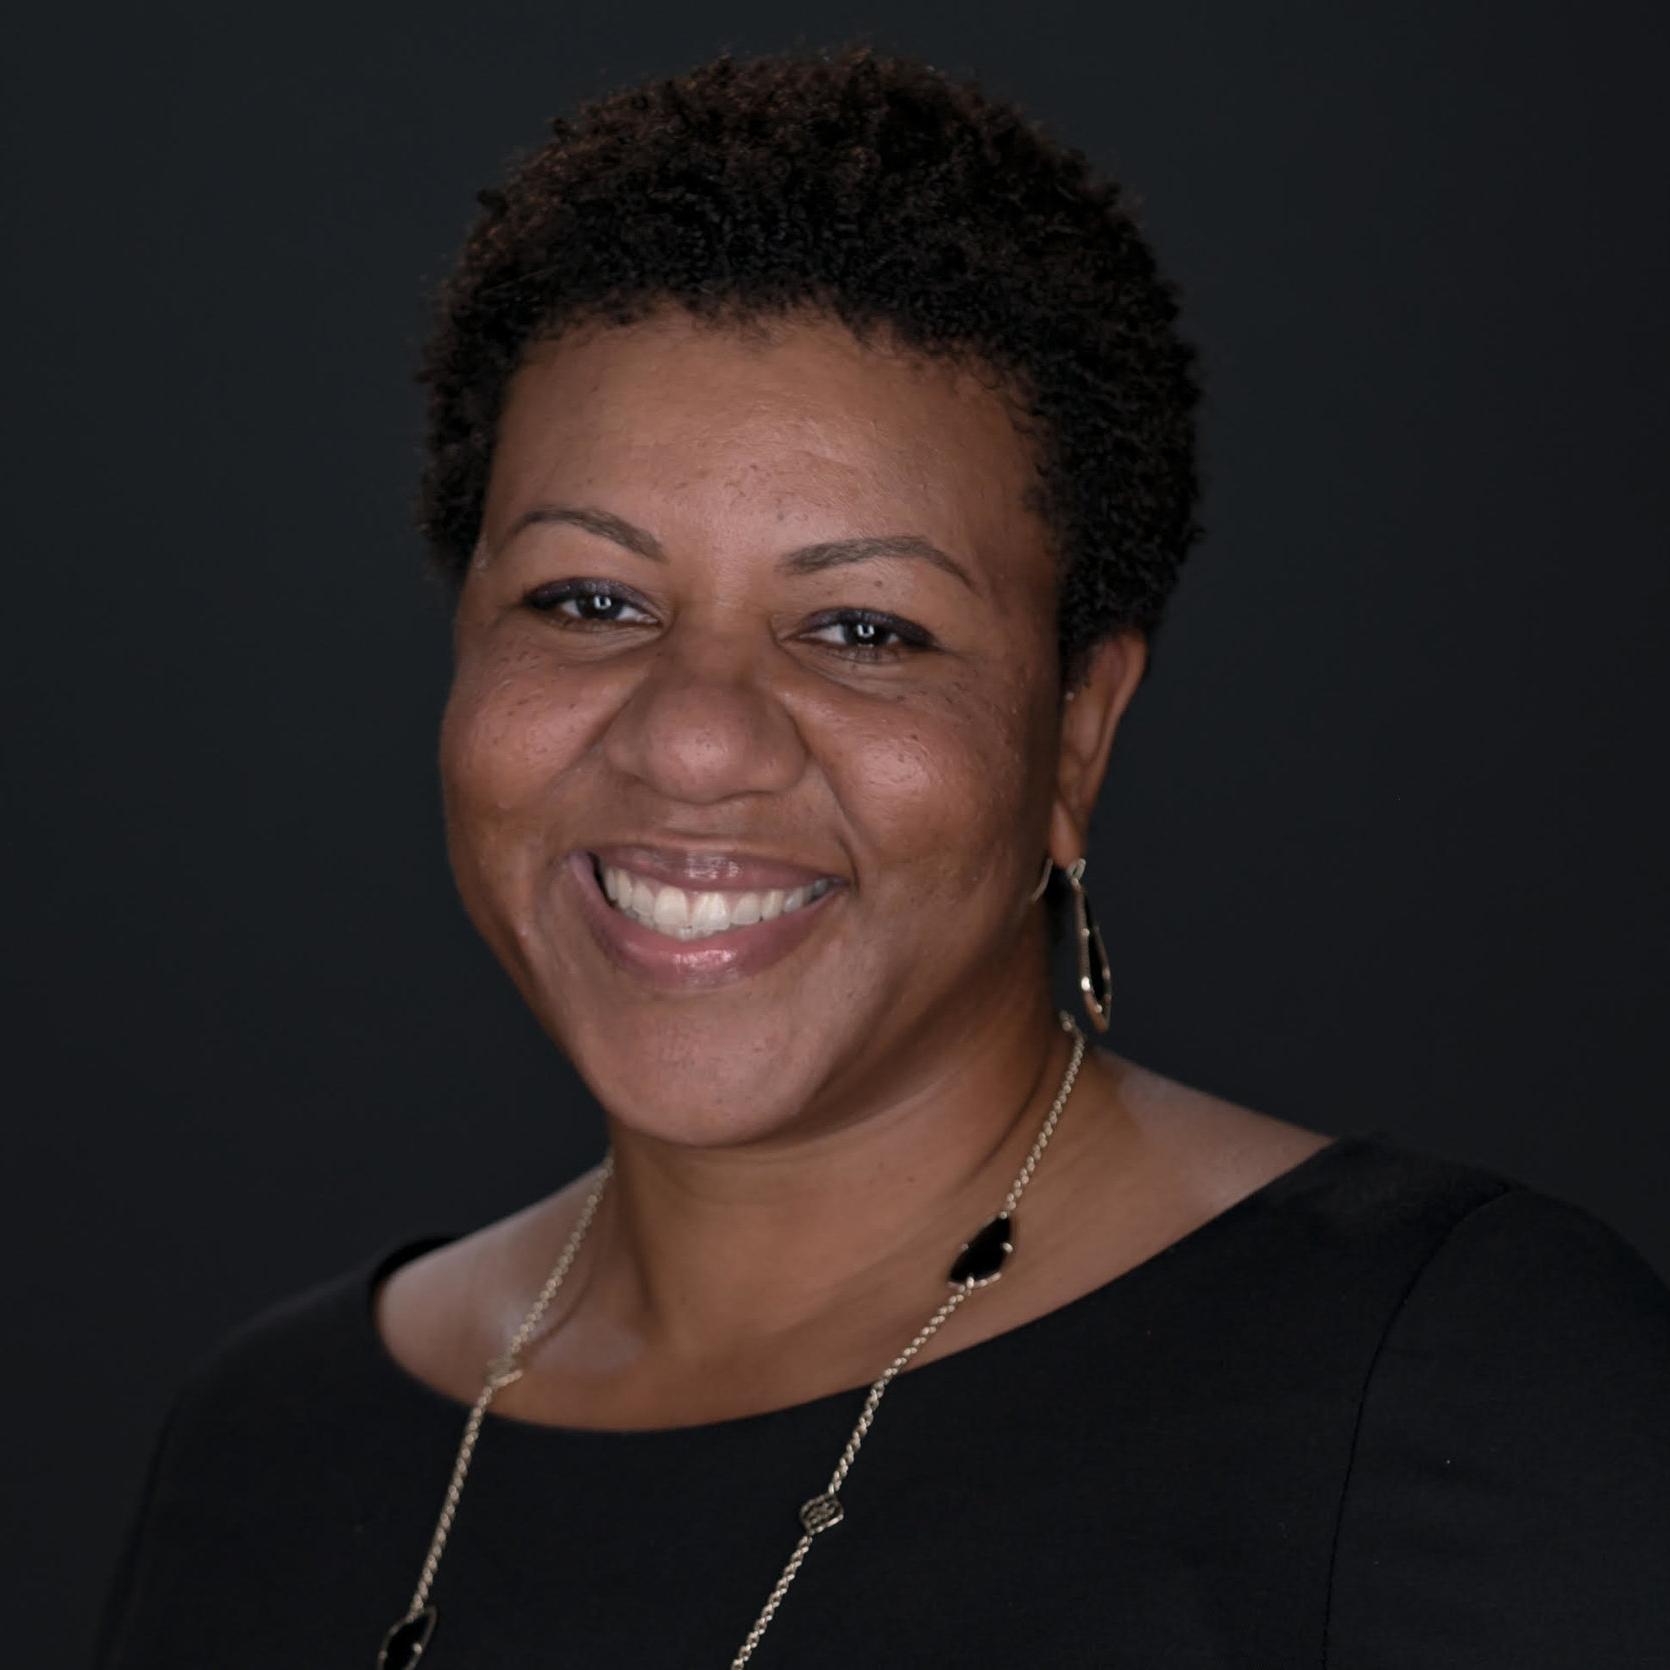 Jennifer Jackson - President at Capital One Canada